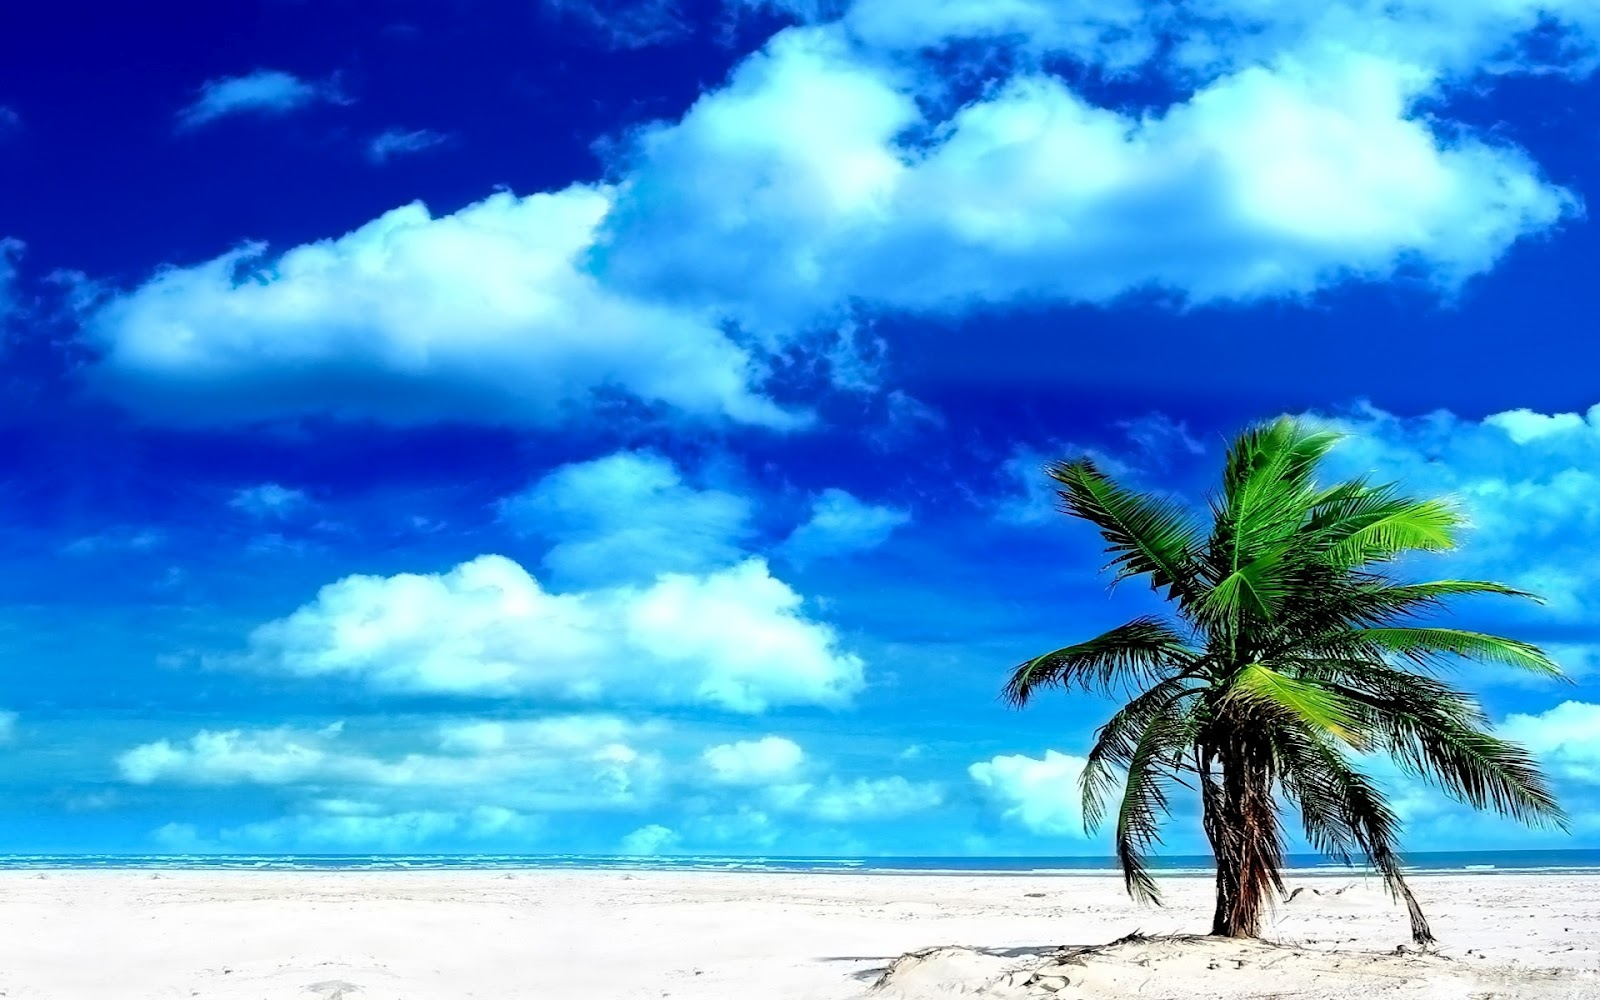 Island Paradise Wallpaper Tourism: Paradi...